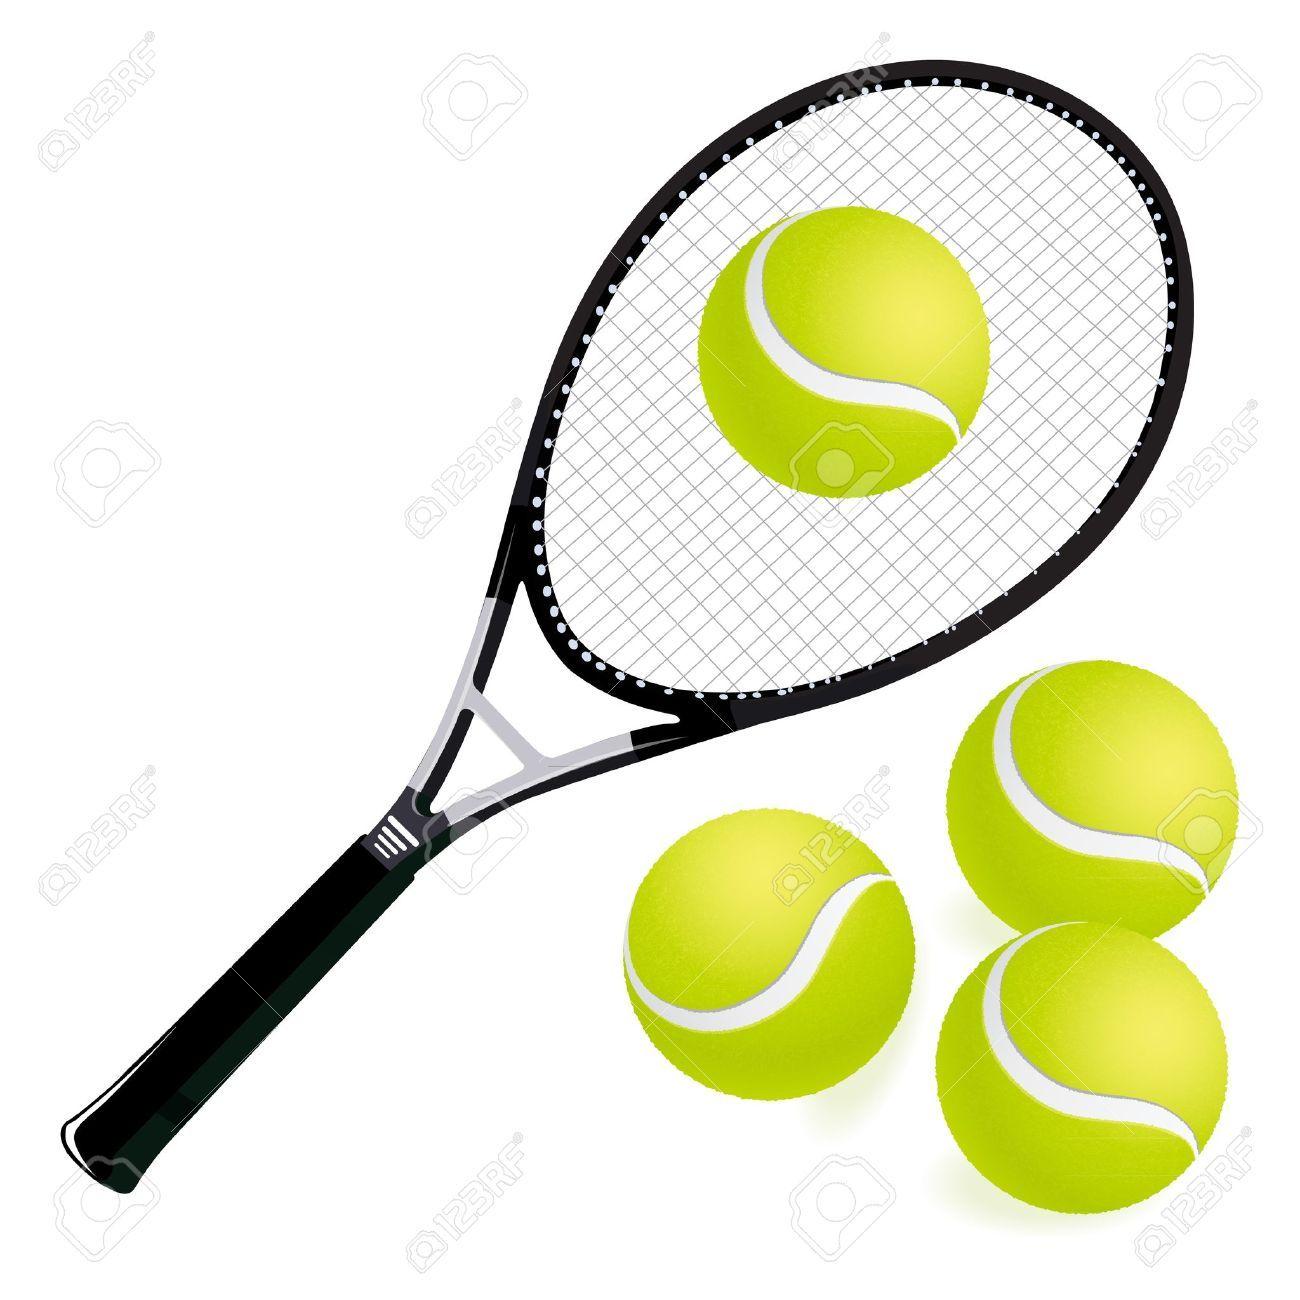 medium resolution of tennis racket stock illustrations cliparts and royalty free 21 559 tennis racket stock